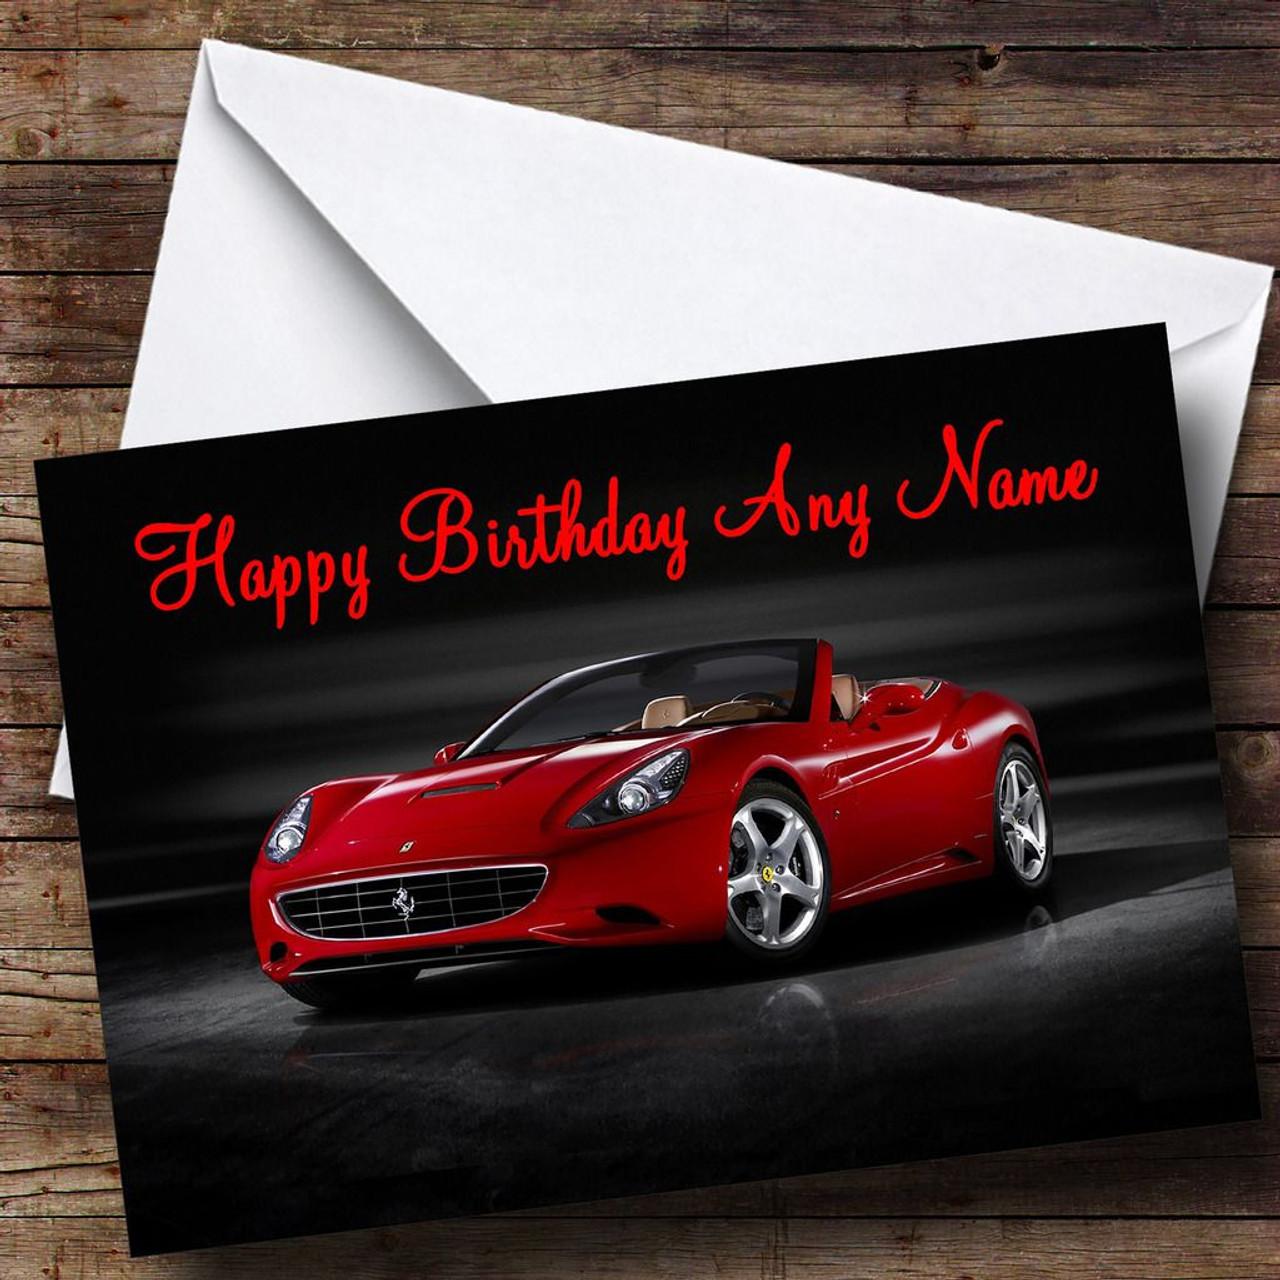 Red Ferrari California Personalised Birthday Card  The